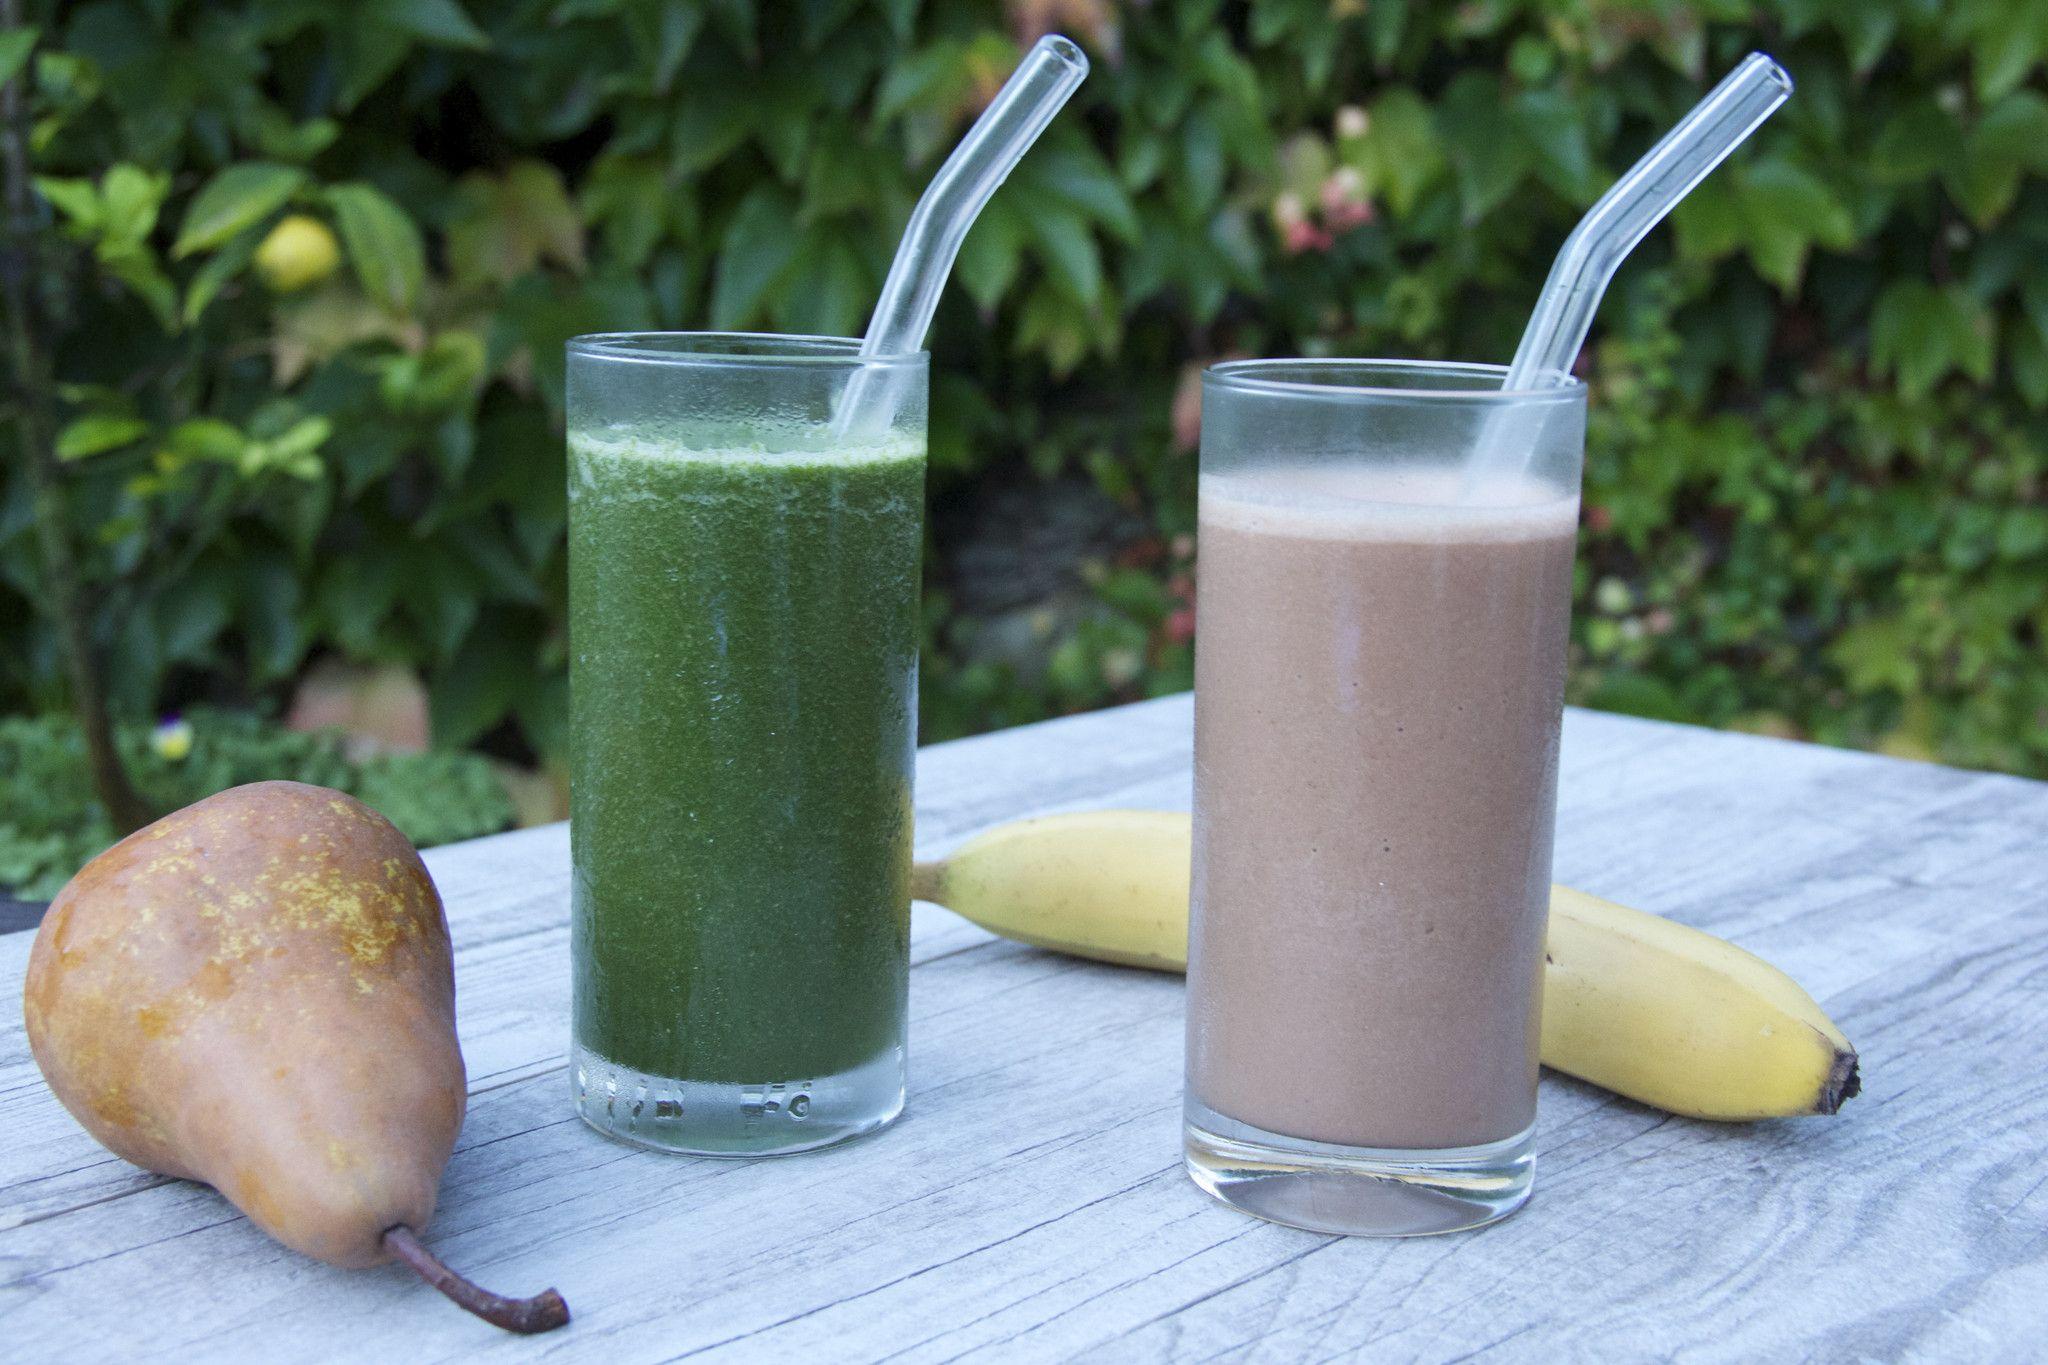 Superfood Smoothies #smoothie #healthy #vegan #recipe #dairyfree #sugarfree #glutenfree #plantbased #begoodorganics